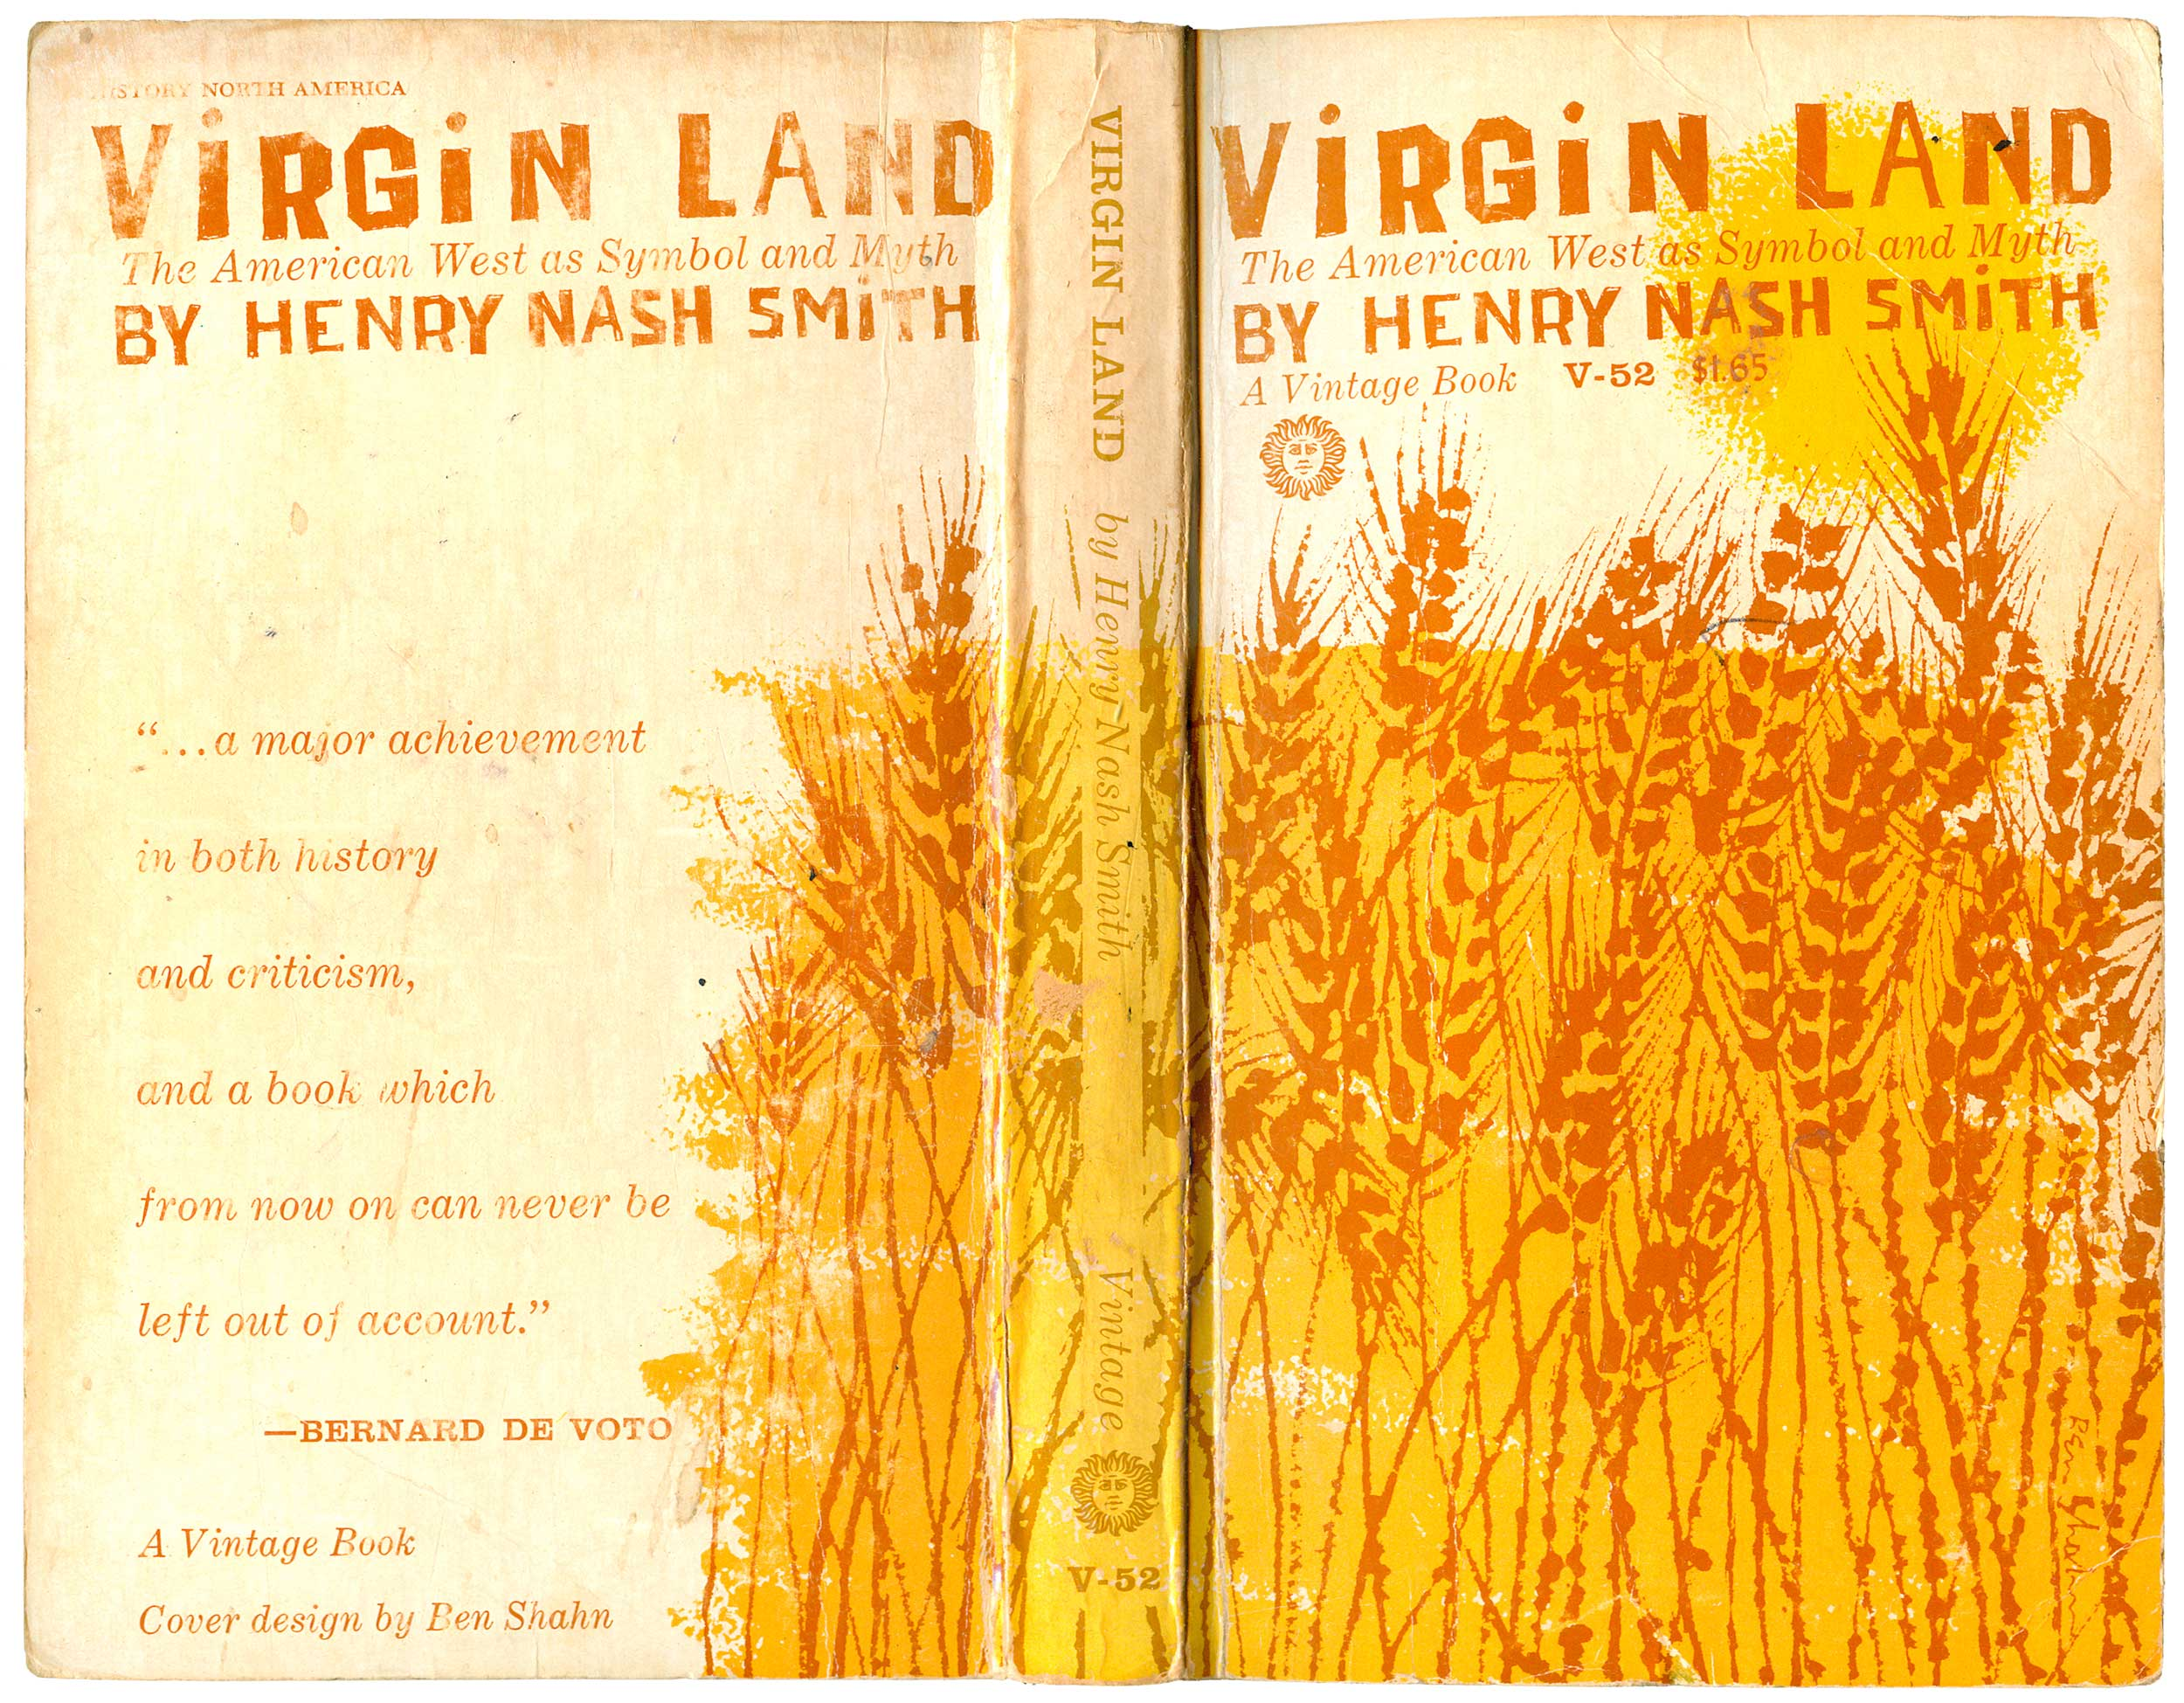 NashSmith_VirginLand_Vintage